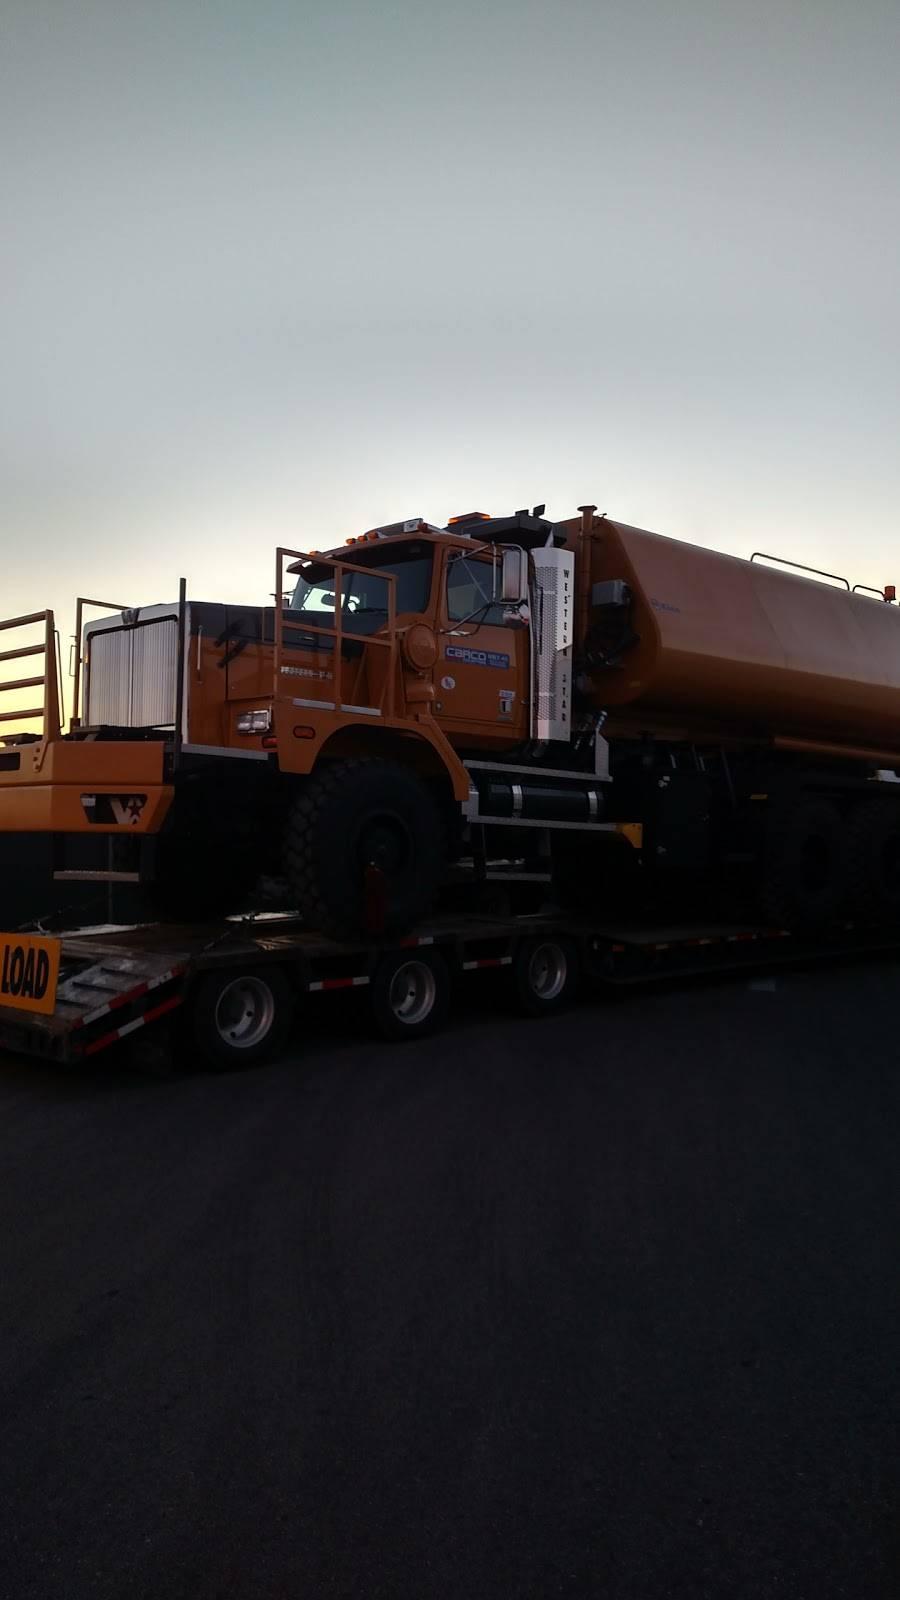 GES Marshaling Yard - moving company  | Photo 7 of 8 | Address: 2982 W Post Rd, Las Vegas, NV 89119, USA | Phone: (702) 263-0234